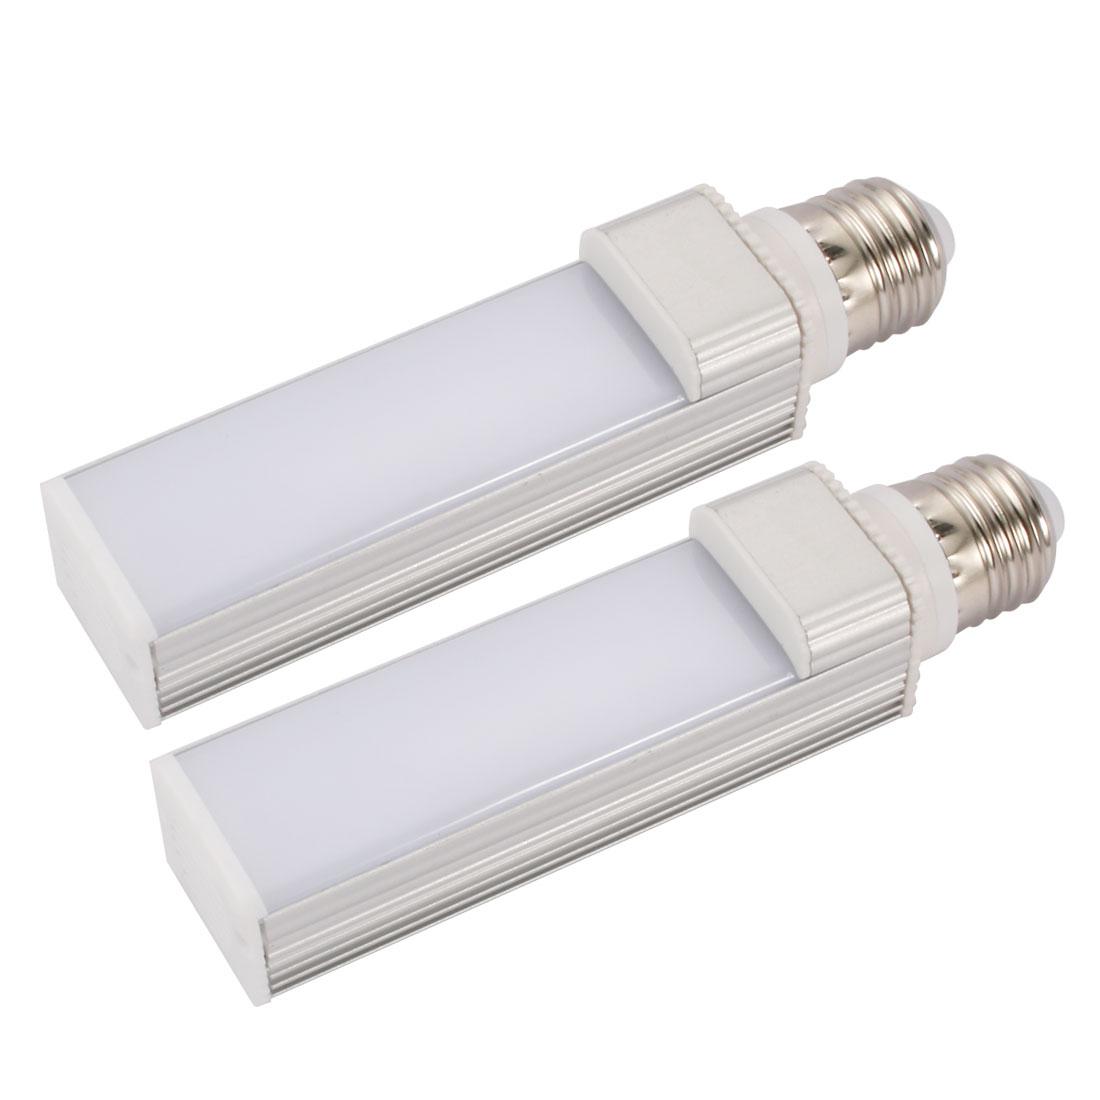 2pack DIY parts for PLC Lamp E27 8W PL-C Lamp Housing Kit w White Cover